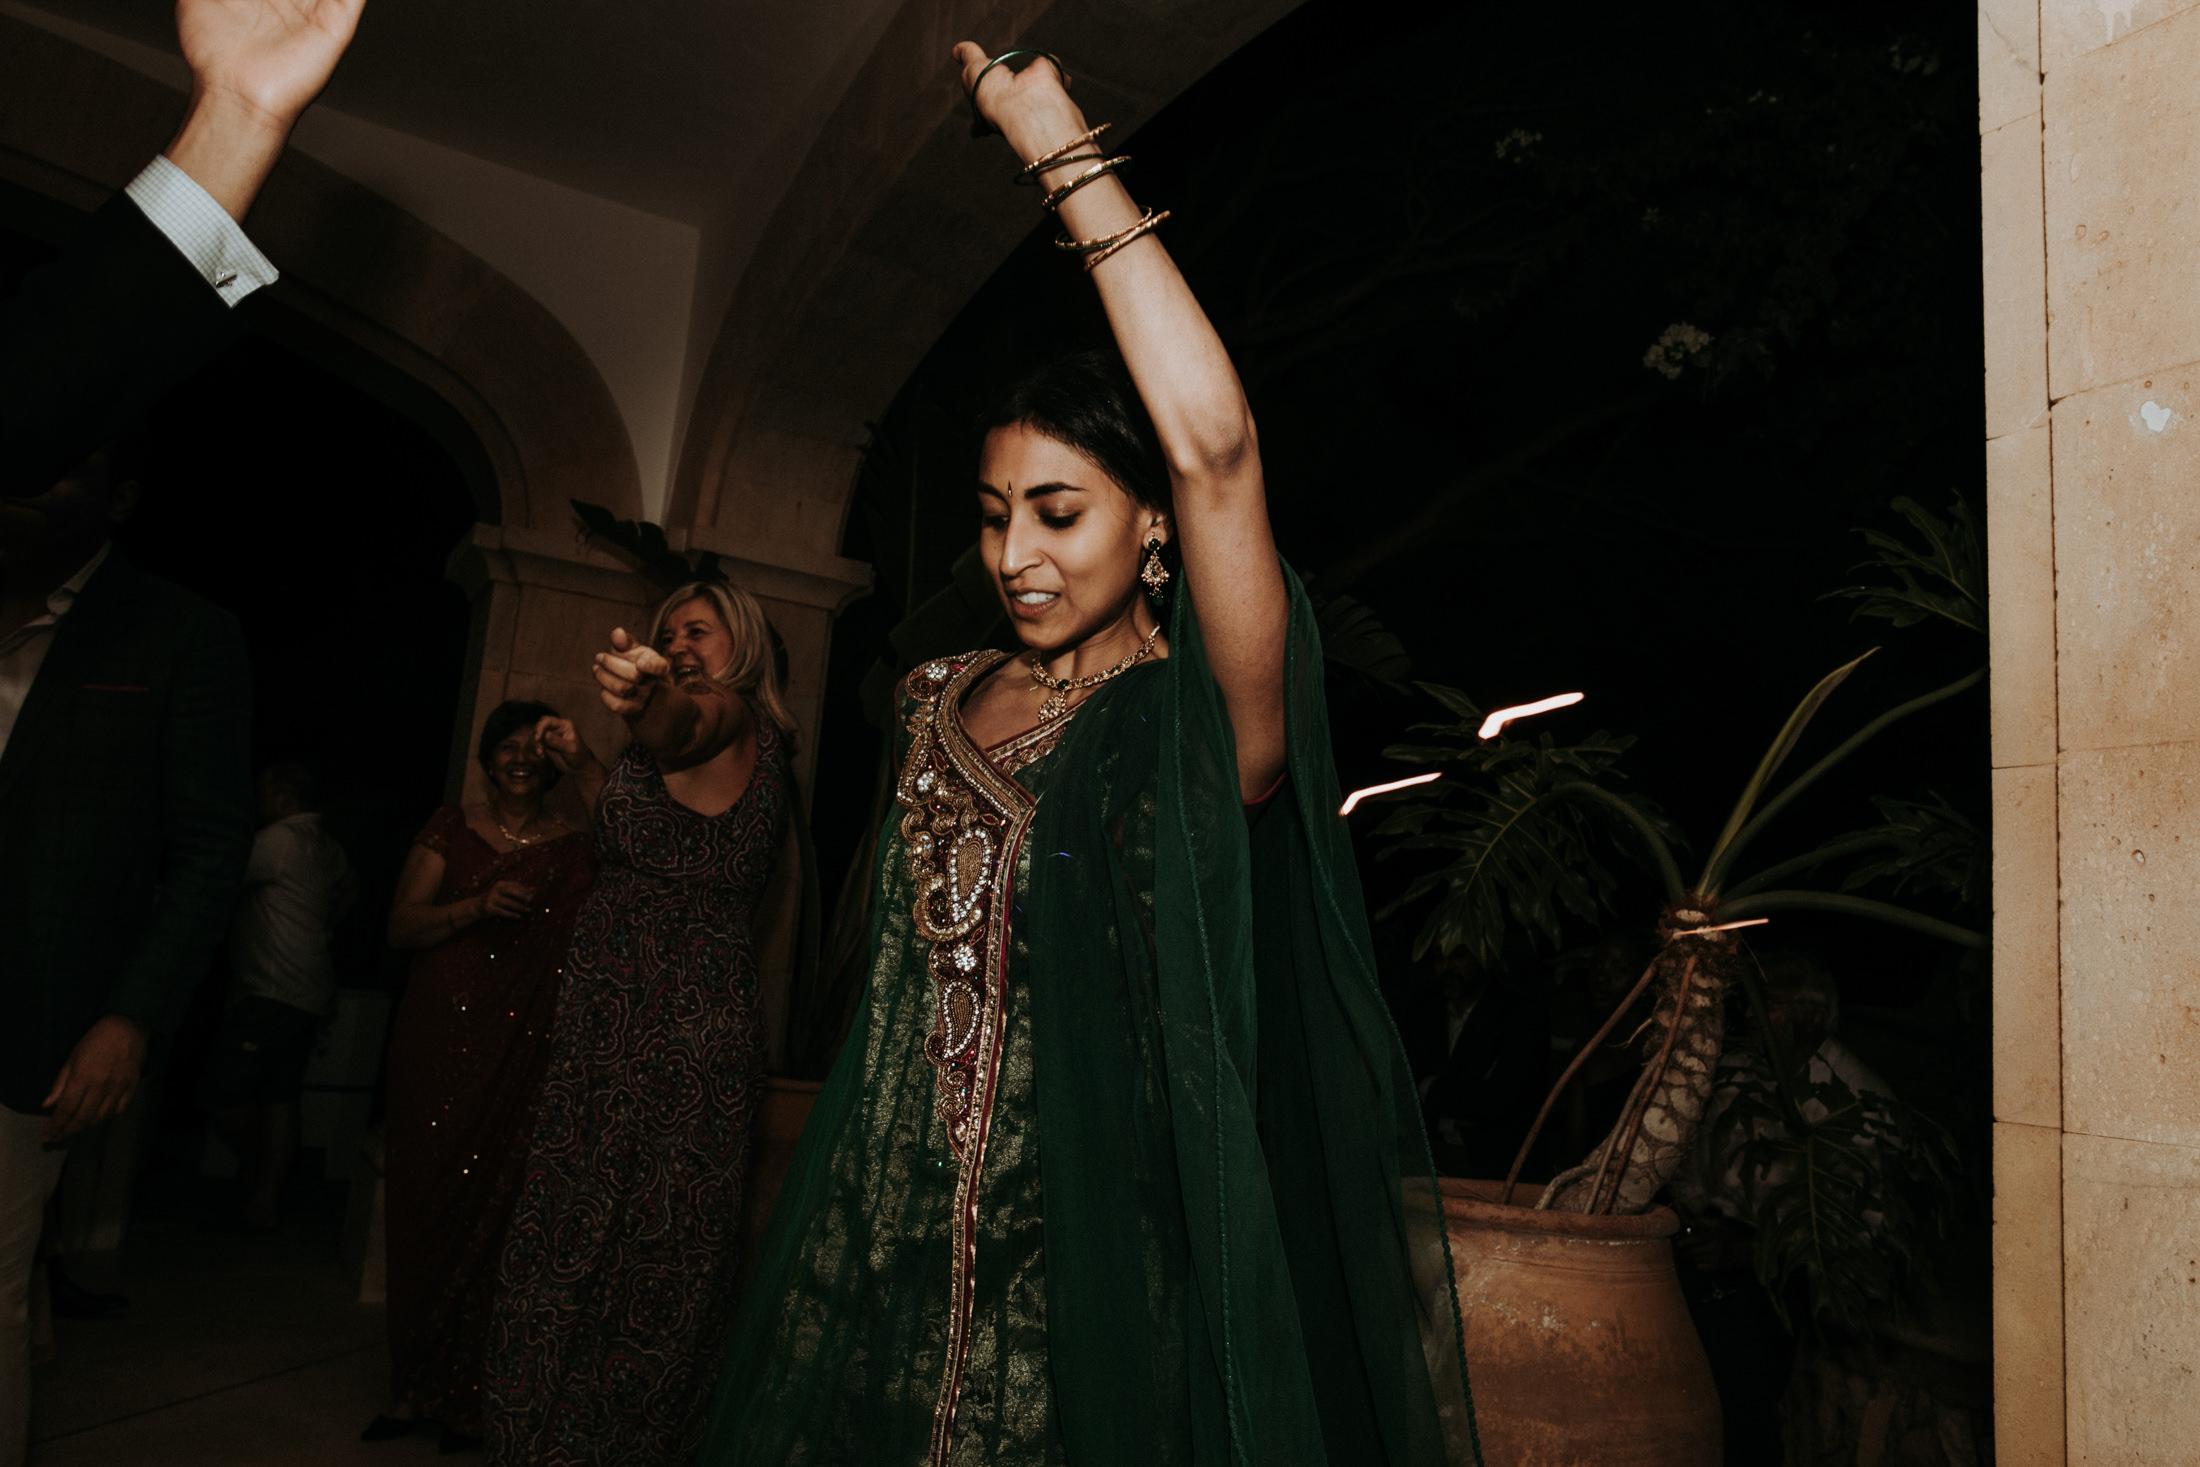 Wedding_Photographer_Mallorca_Daniela-Marquardt_Photography_New_York_Iceland_Tuscany_Santorini_Portugal_Austria_Bavaria_Elopement_Hochzeitsfotograf_AntjeRajat1_64